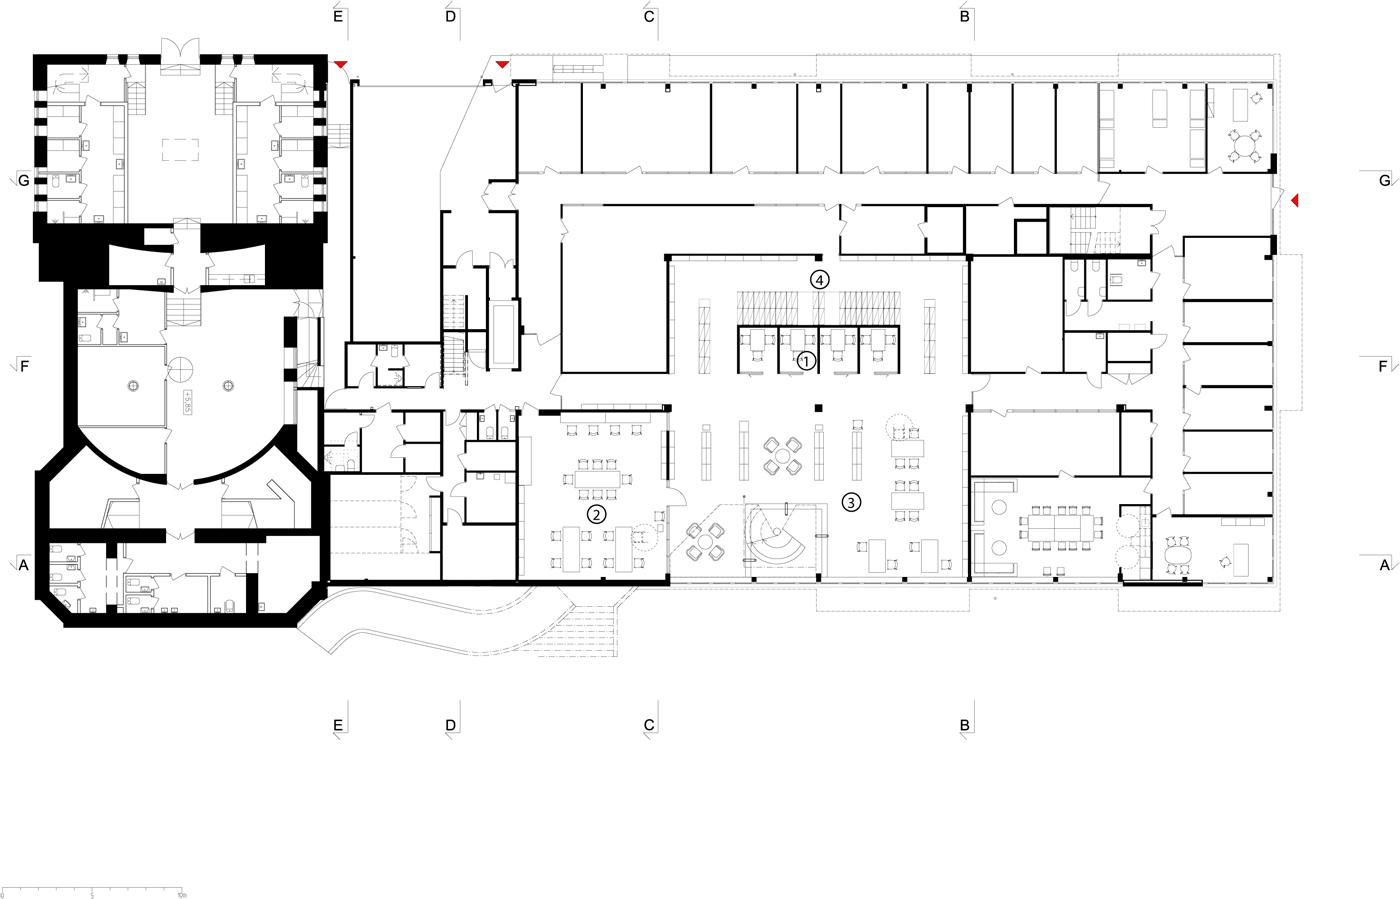 Komedianten Cultural Center / Nyréns Arkitektkontor